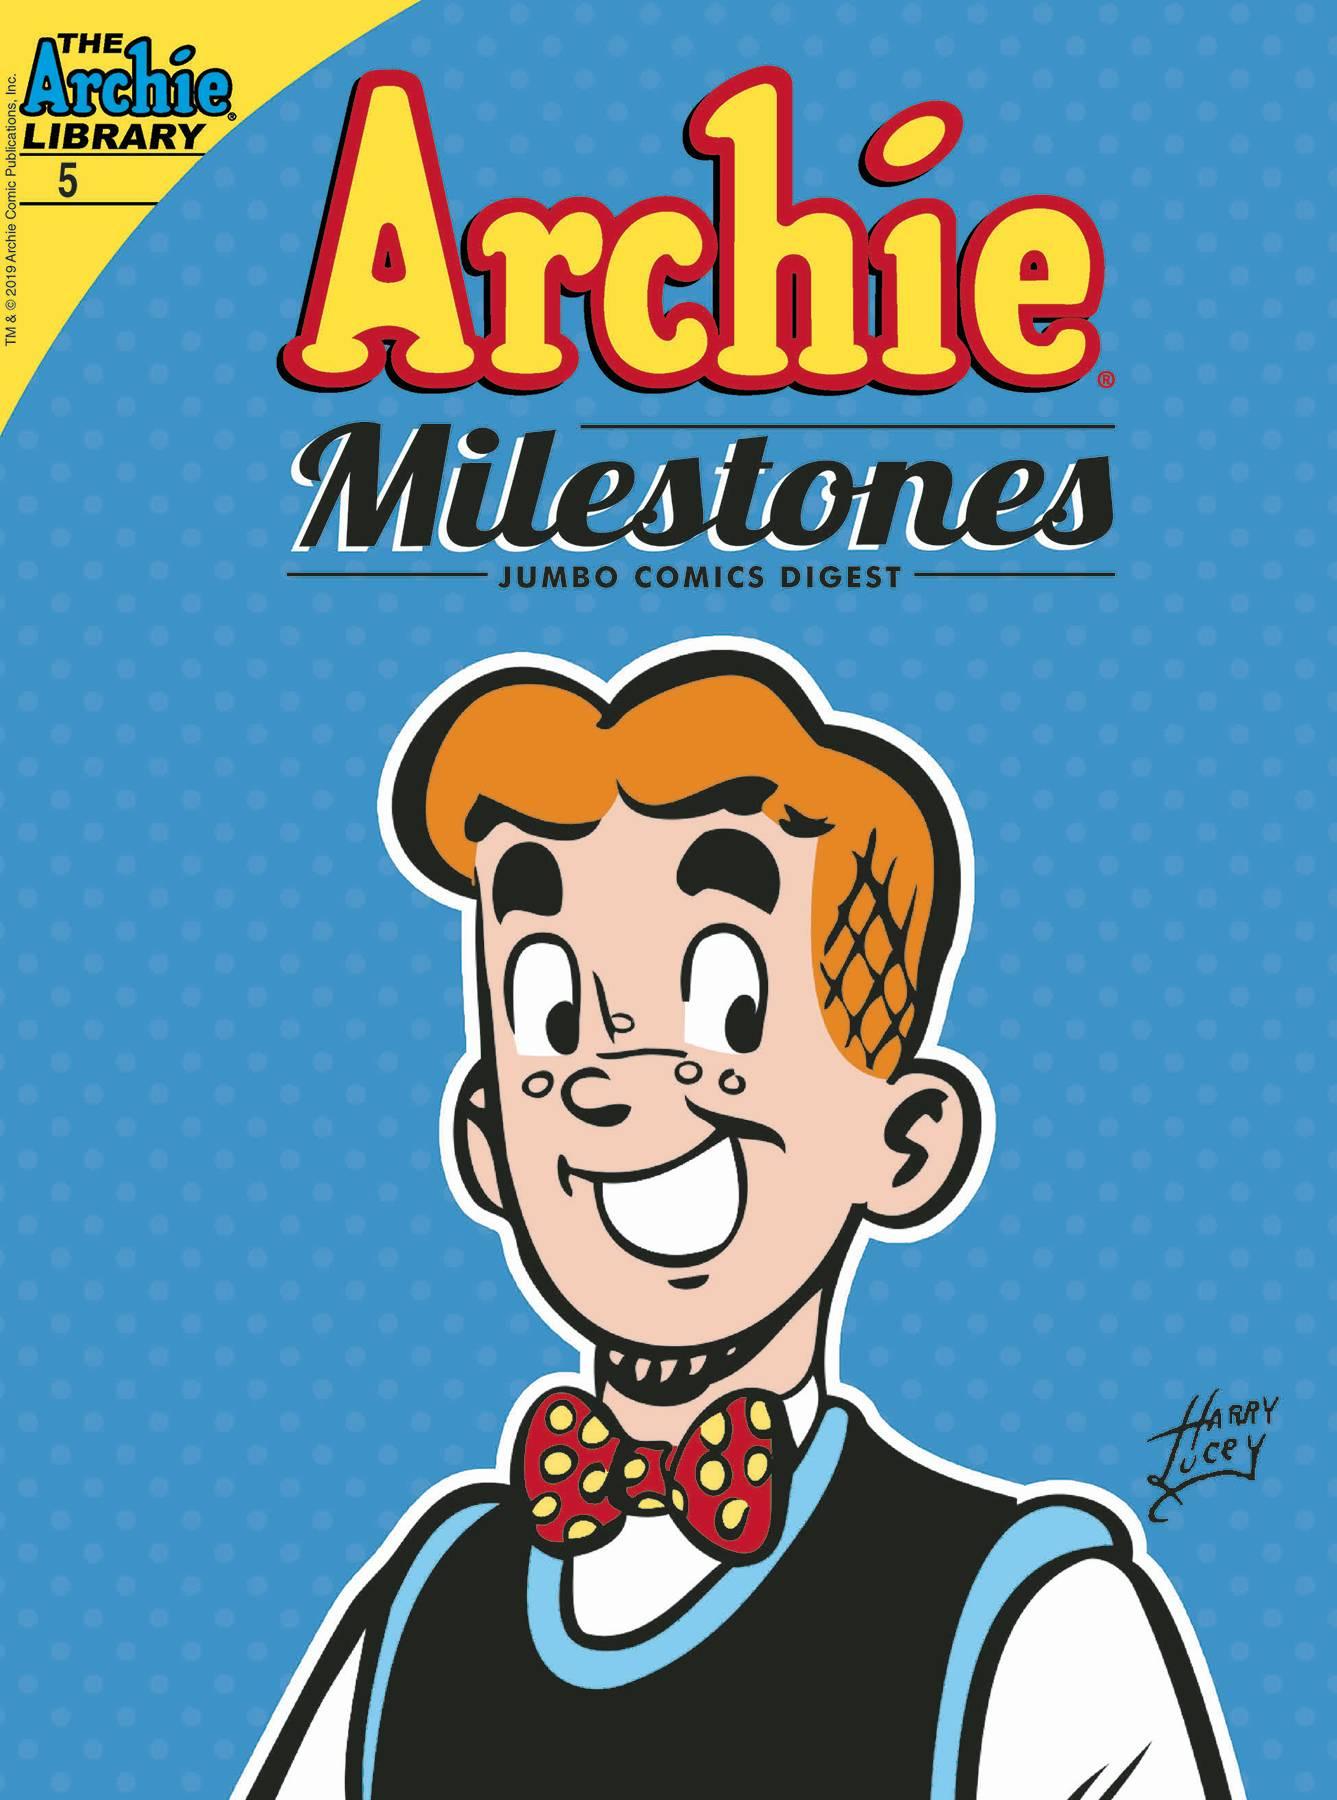 Archie Milestones Jumbo Comics Digest #5 (2019)